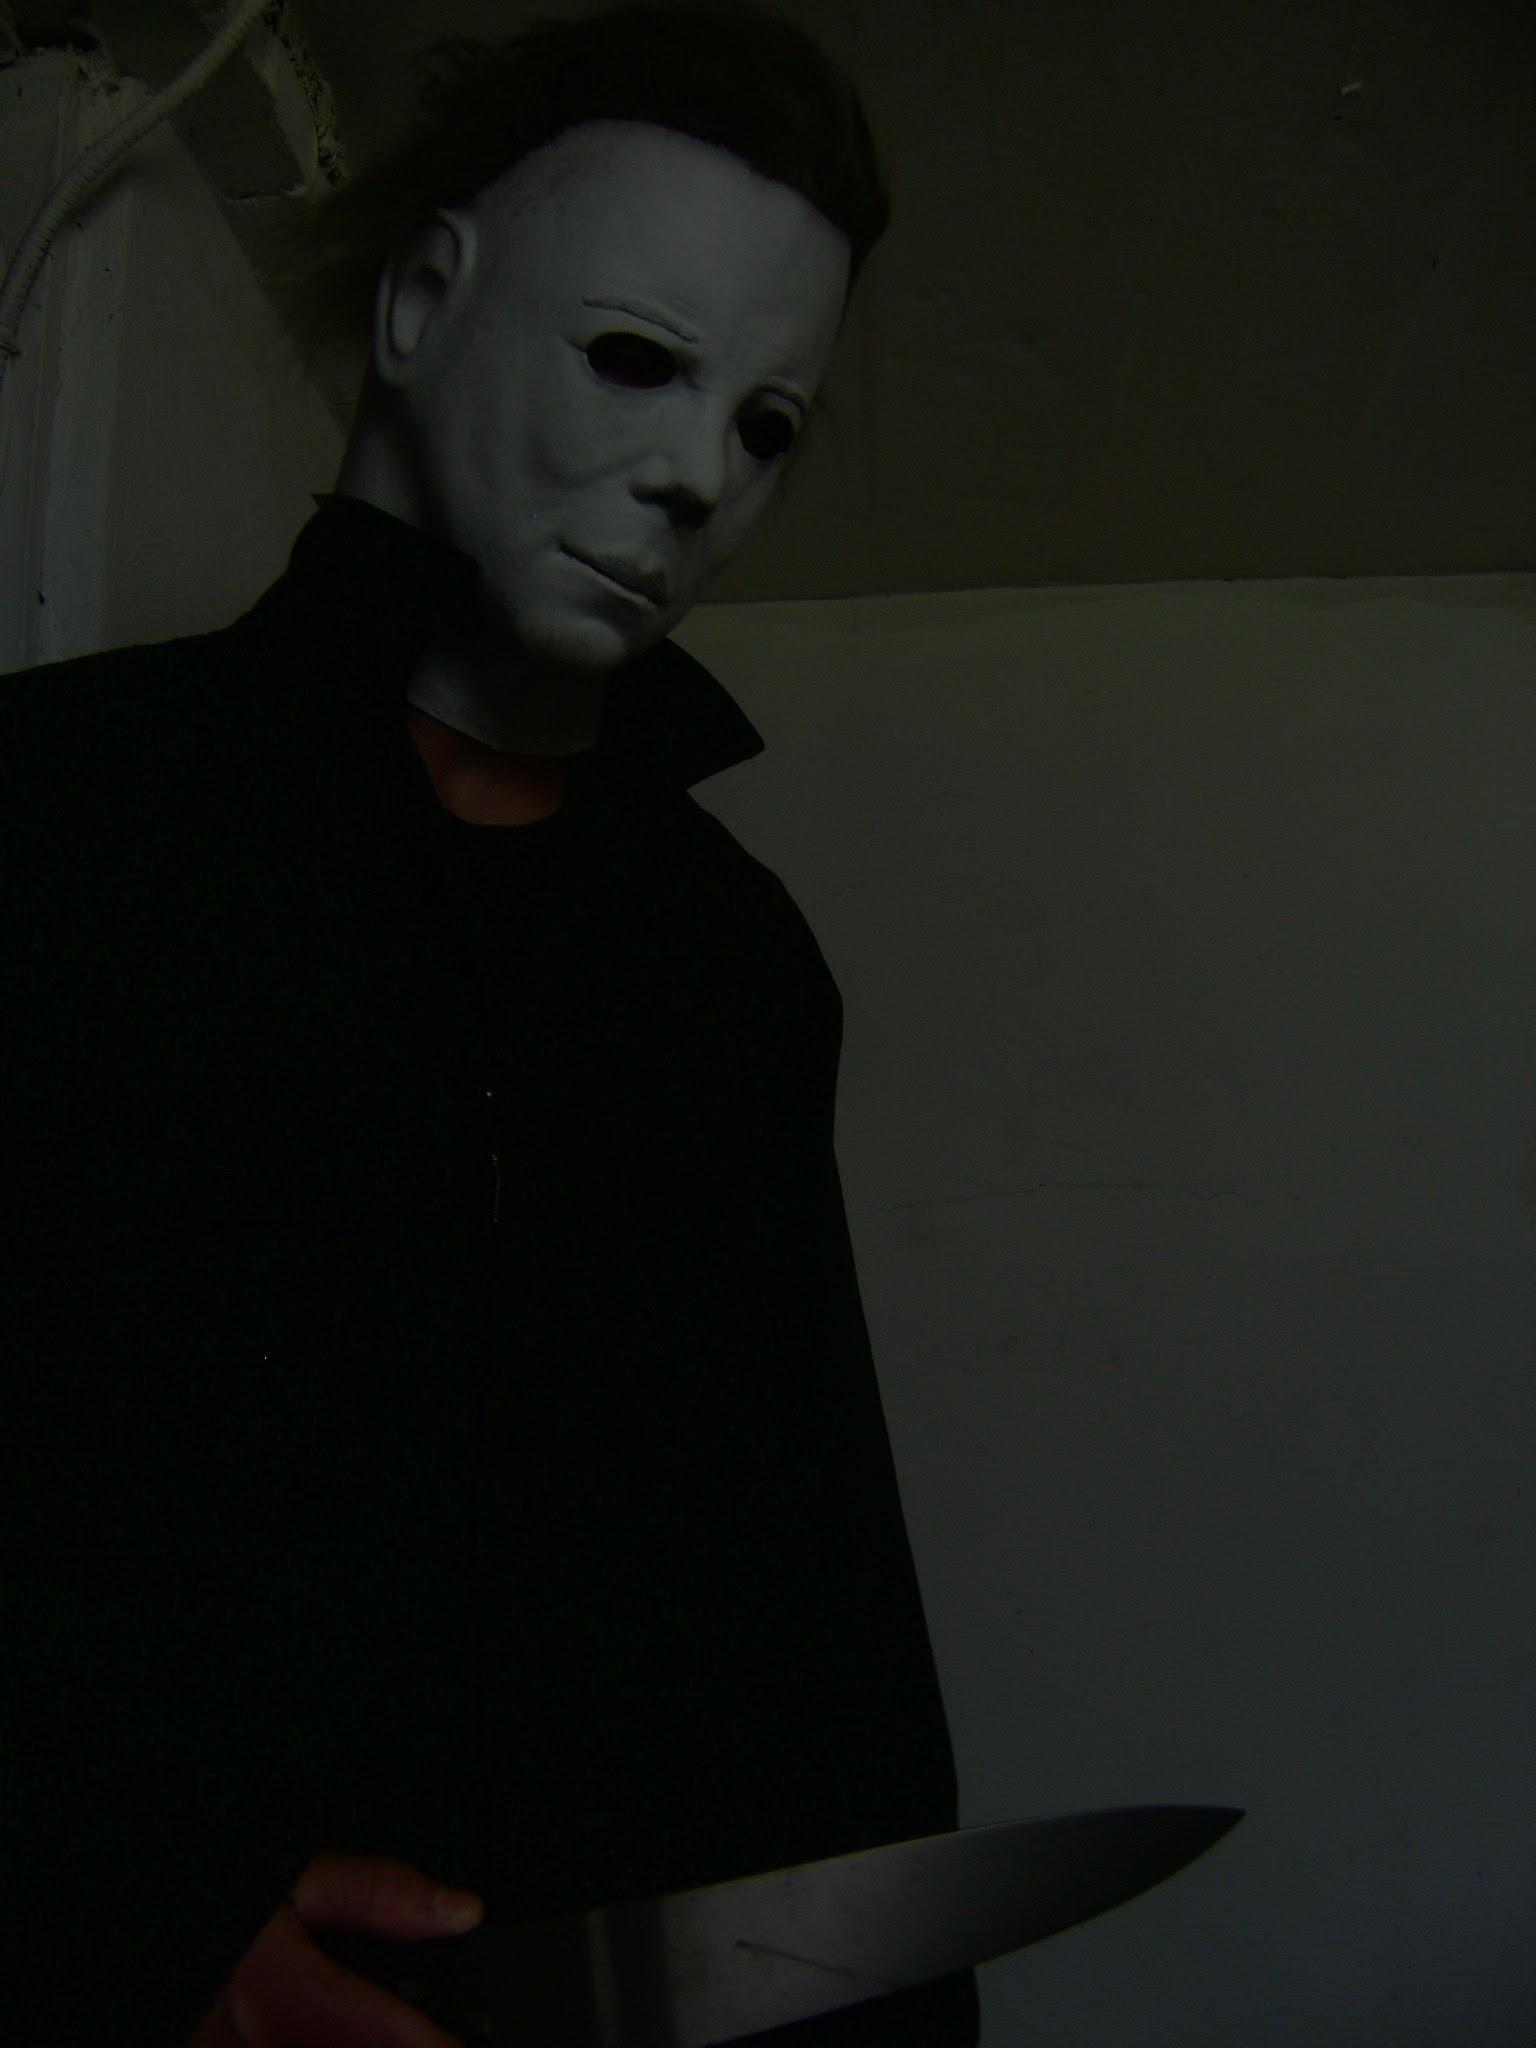 Halloween Michael Myers Wallpaper 77 Images